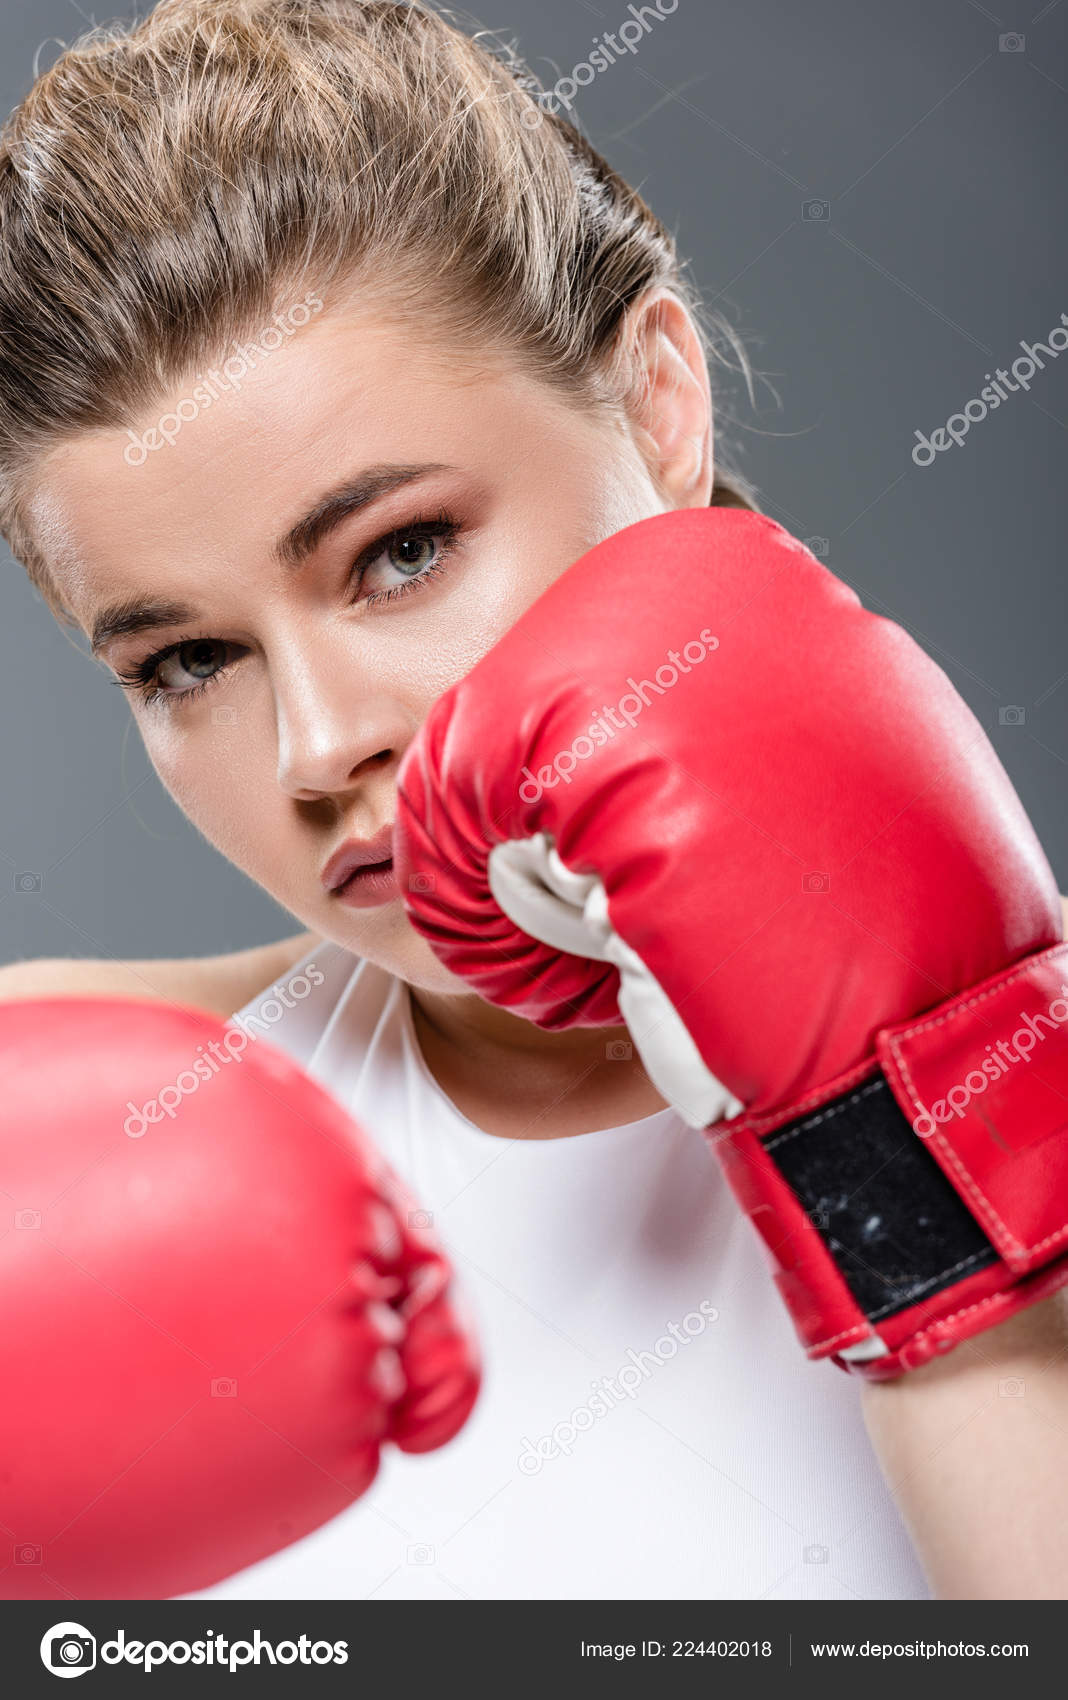 56a38f7dfd07 Προβολή Μεγέθυνση Από Νεαρή Γυναίκα Γάντια Του Μποξ Που Βλέπουν — Φωτογραφία  Αρχείου